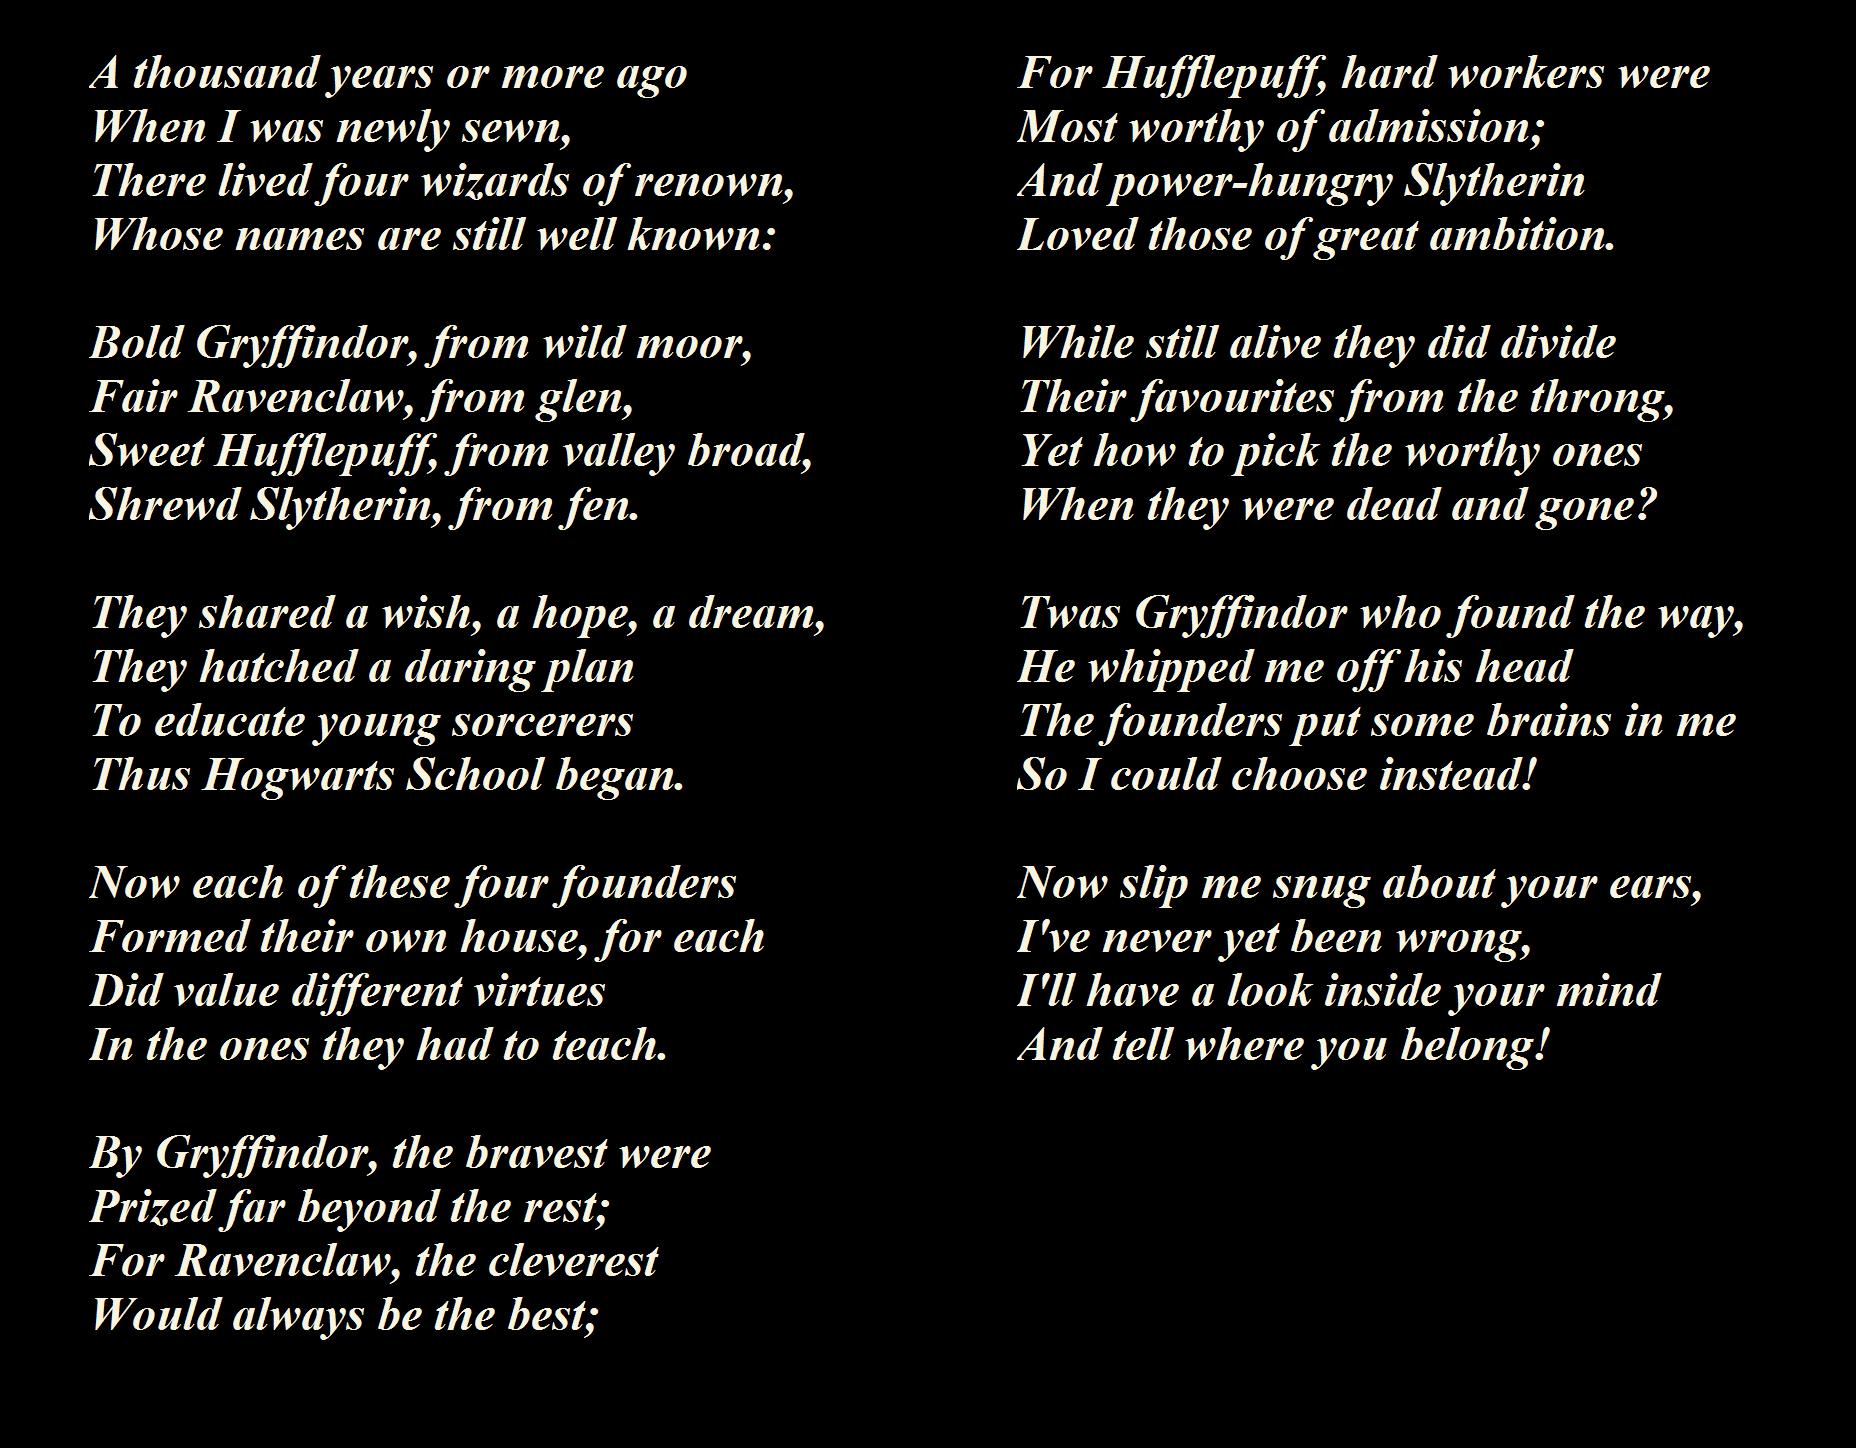 sorting hat songs lyrics - Google Search | wizard world